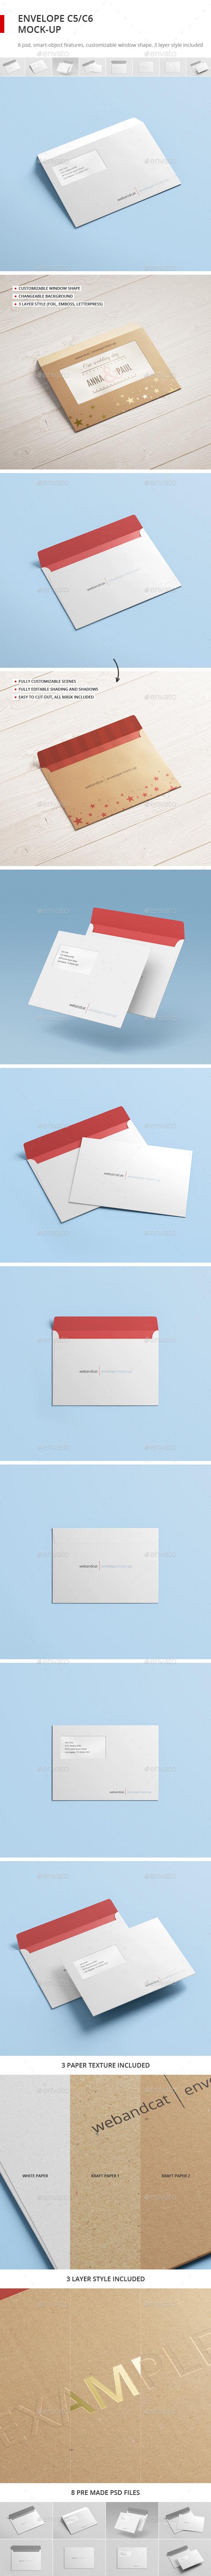 Envelope C5 / C6 Mock-up (Stationery)